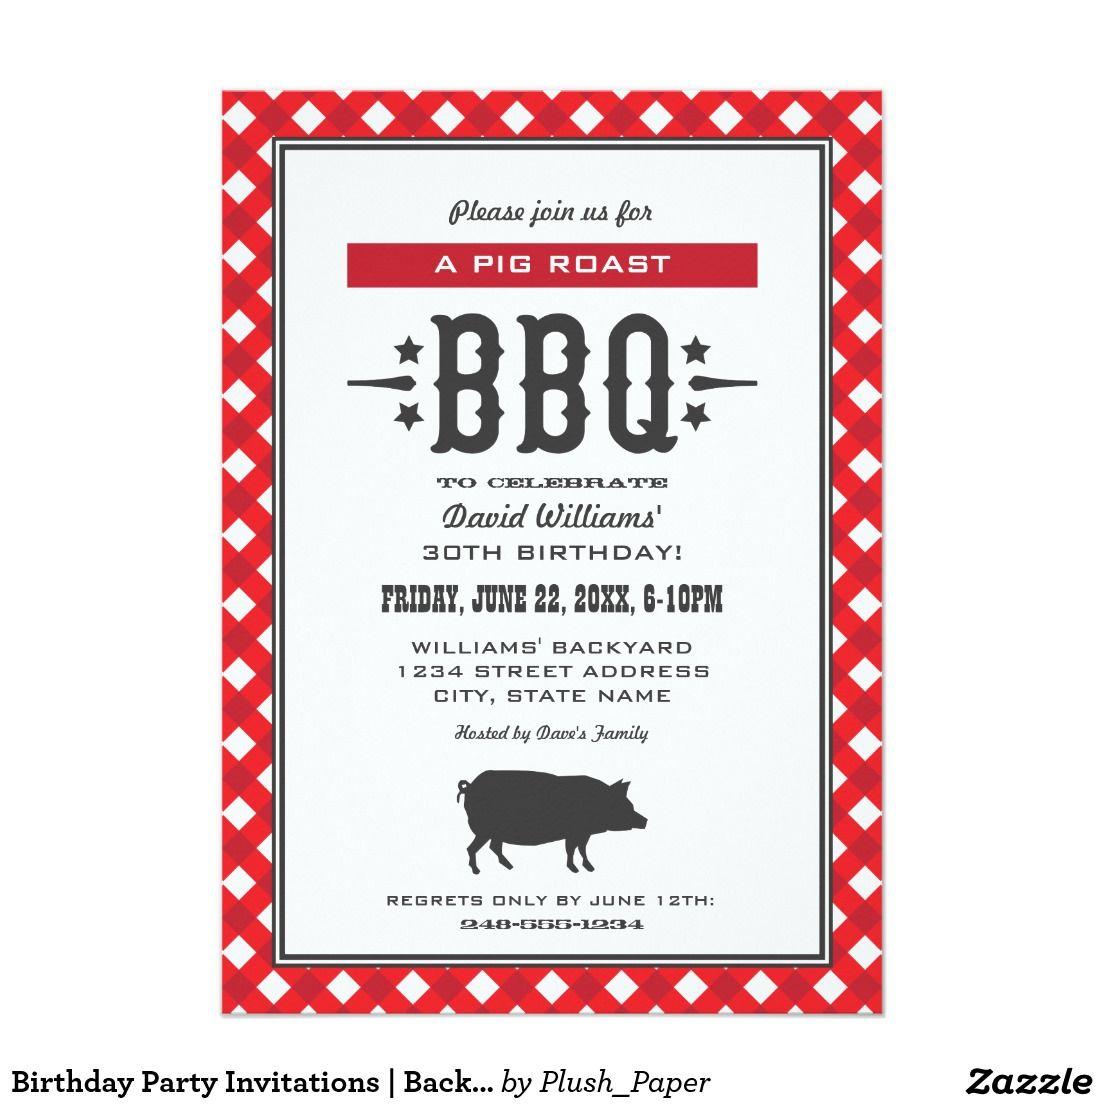 Birthday Party Invitations | Backyard BBQ Theme | Backyard bbq ...